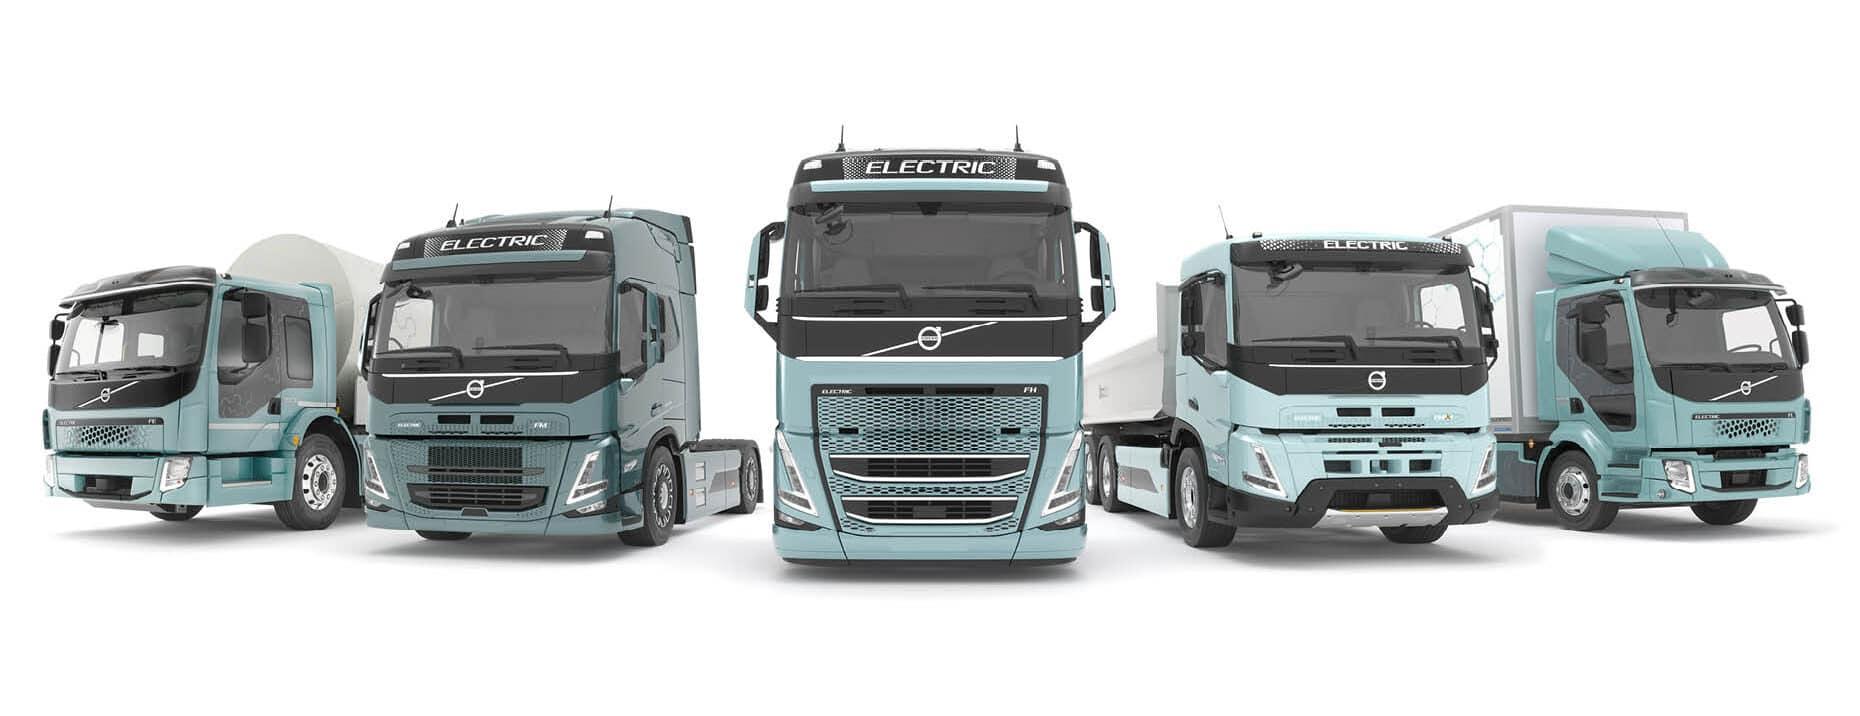 Image of electric Volvo Trucks